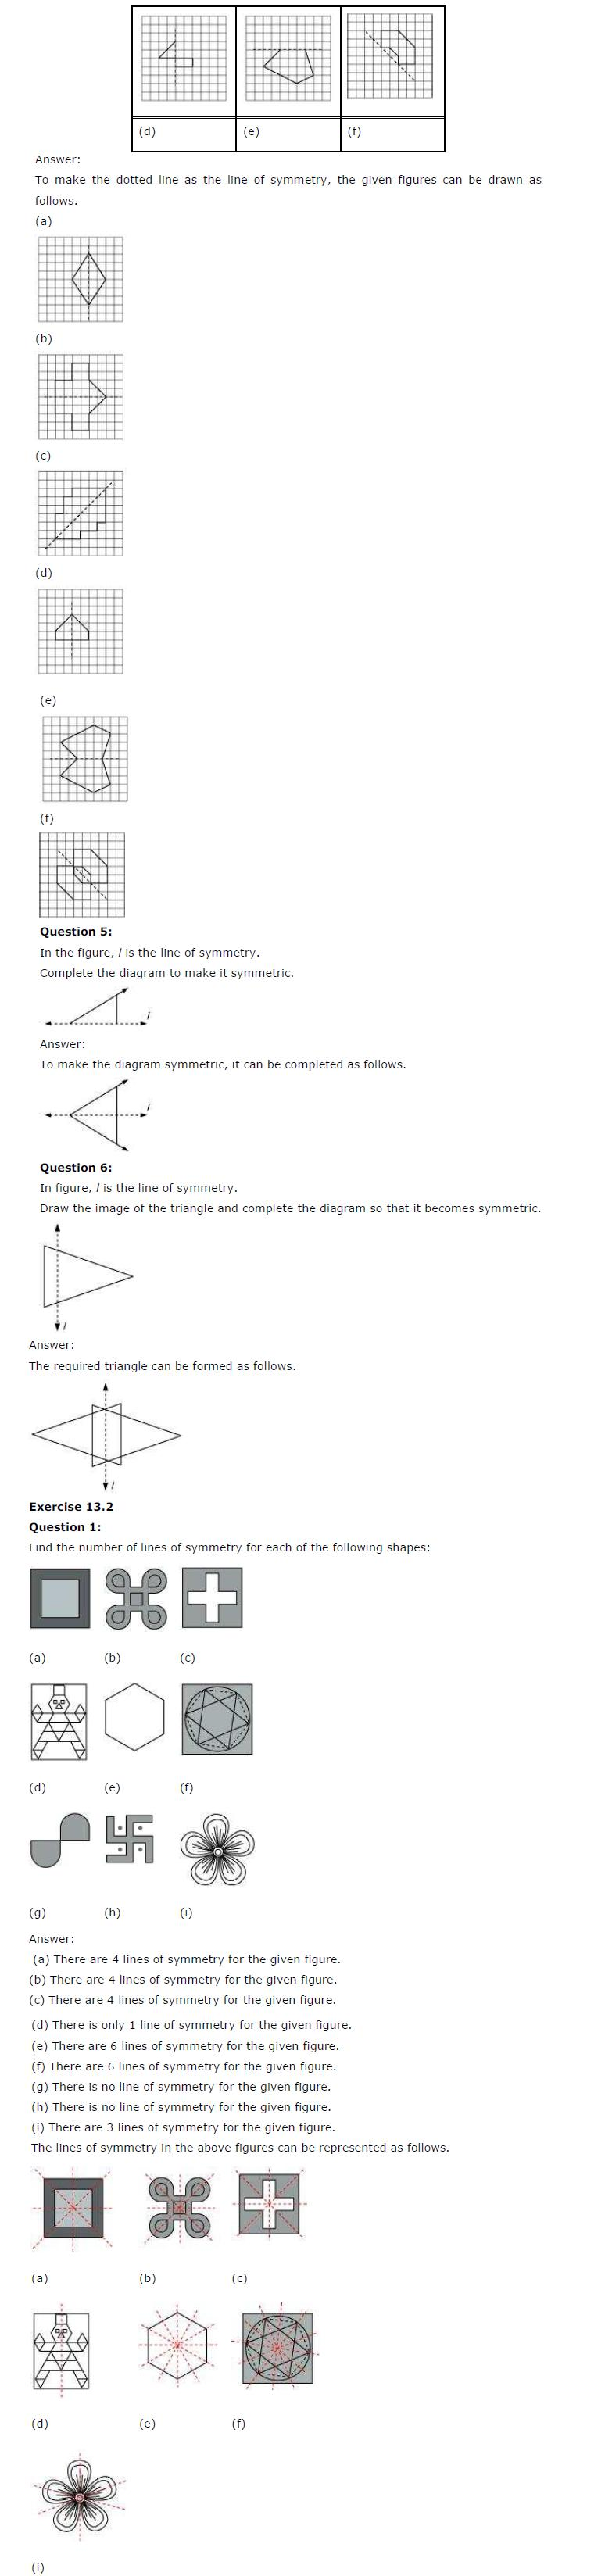 medium resolution of Algebra Worksheets For Grade 6 Cbse maths integers worksheets for grade 6  adding using math - Easy Math